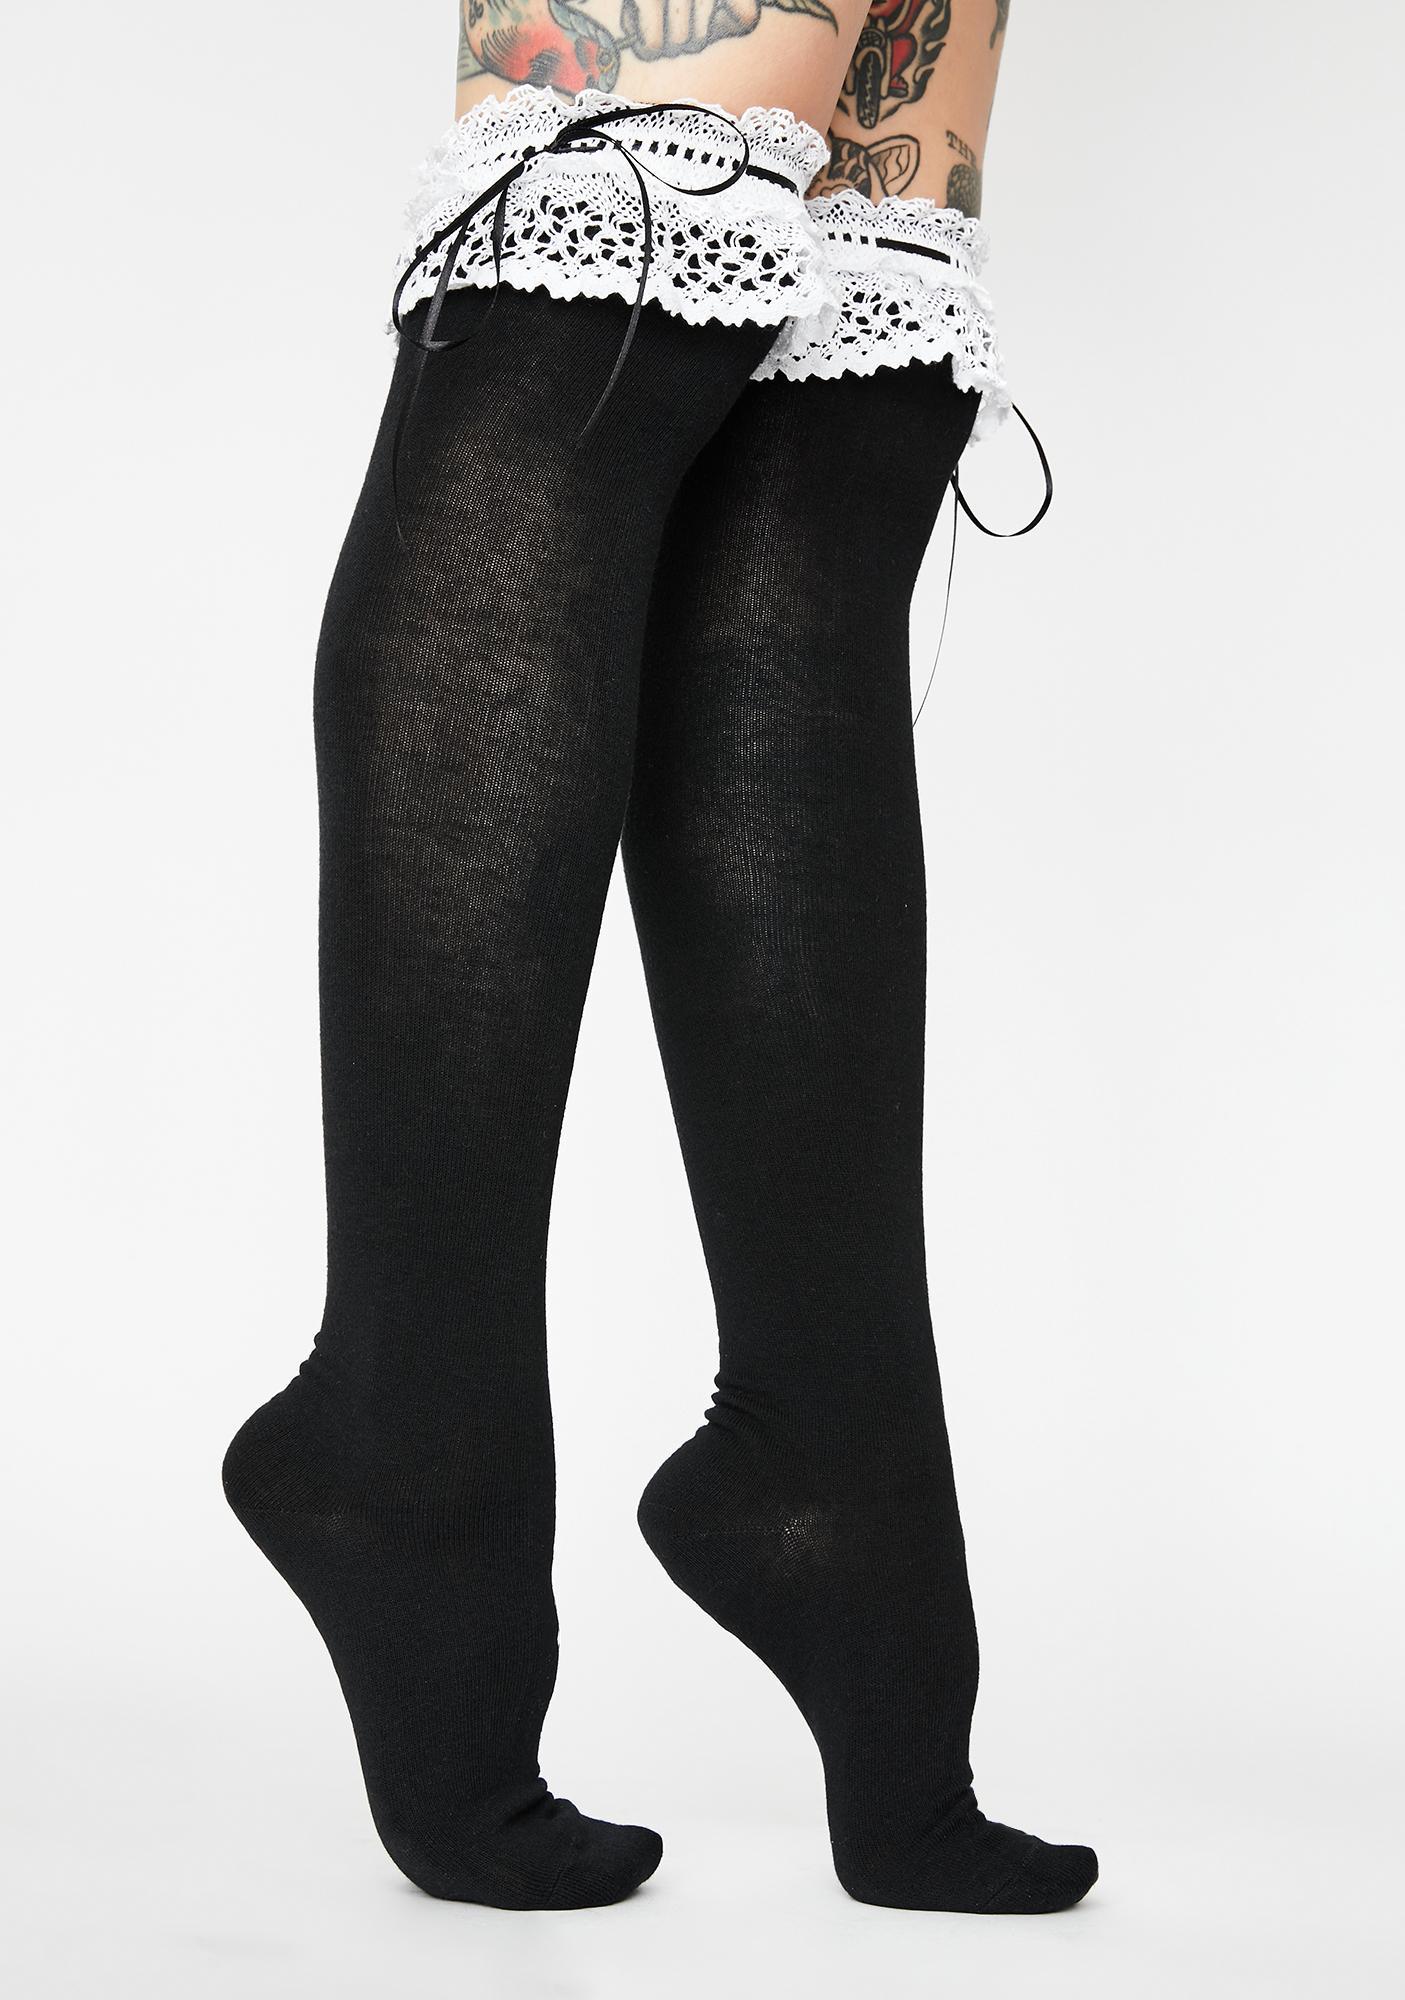 Reanimated Rag Doll Thigh High Socks